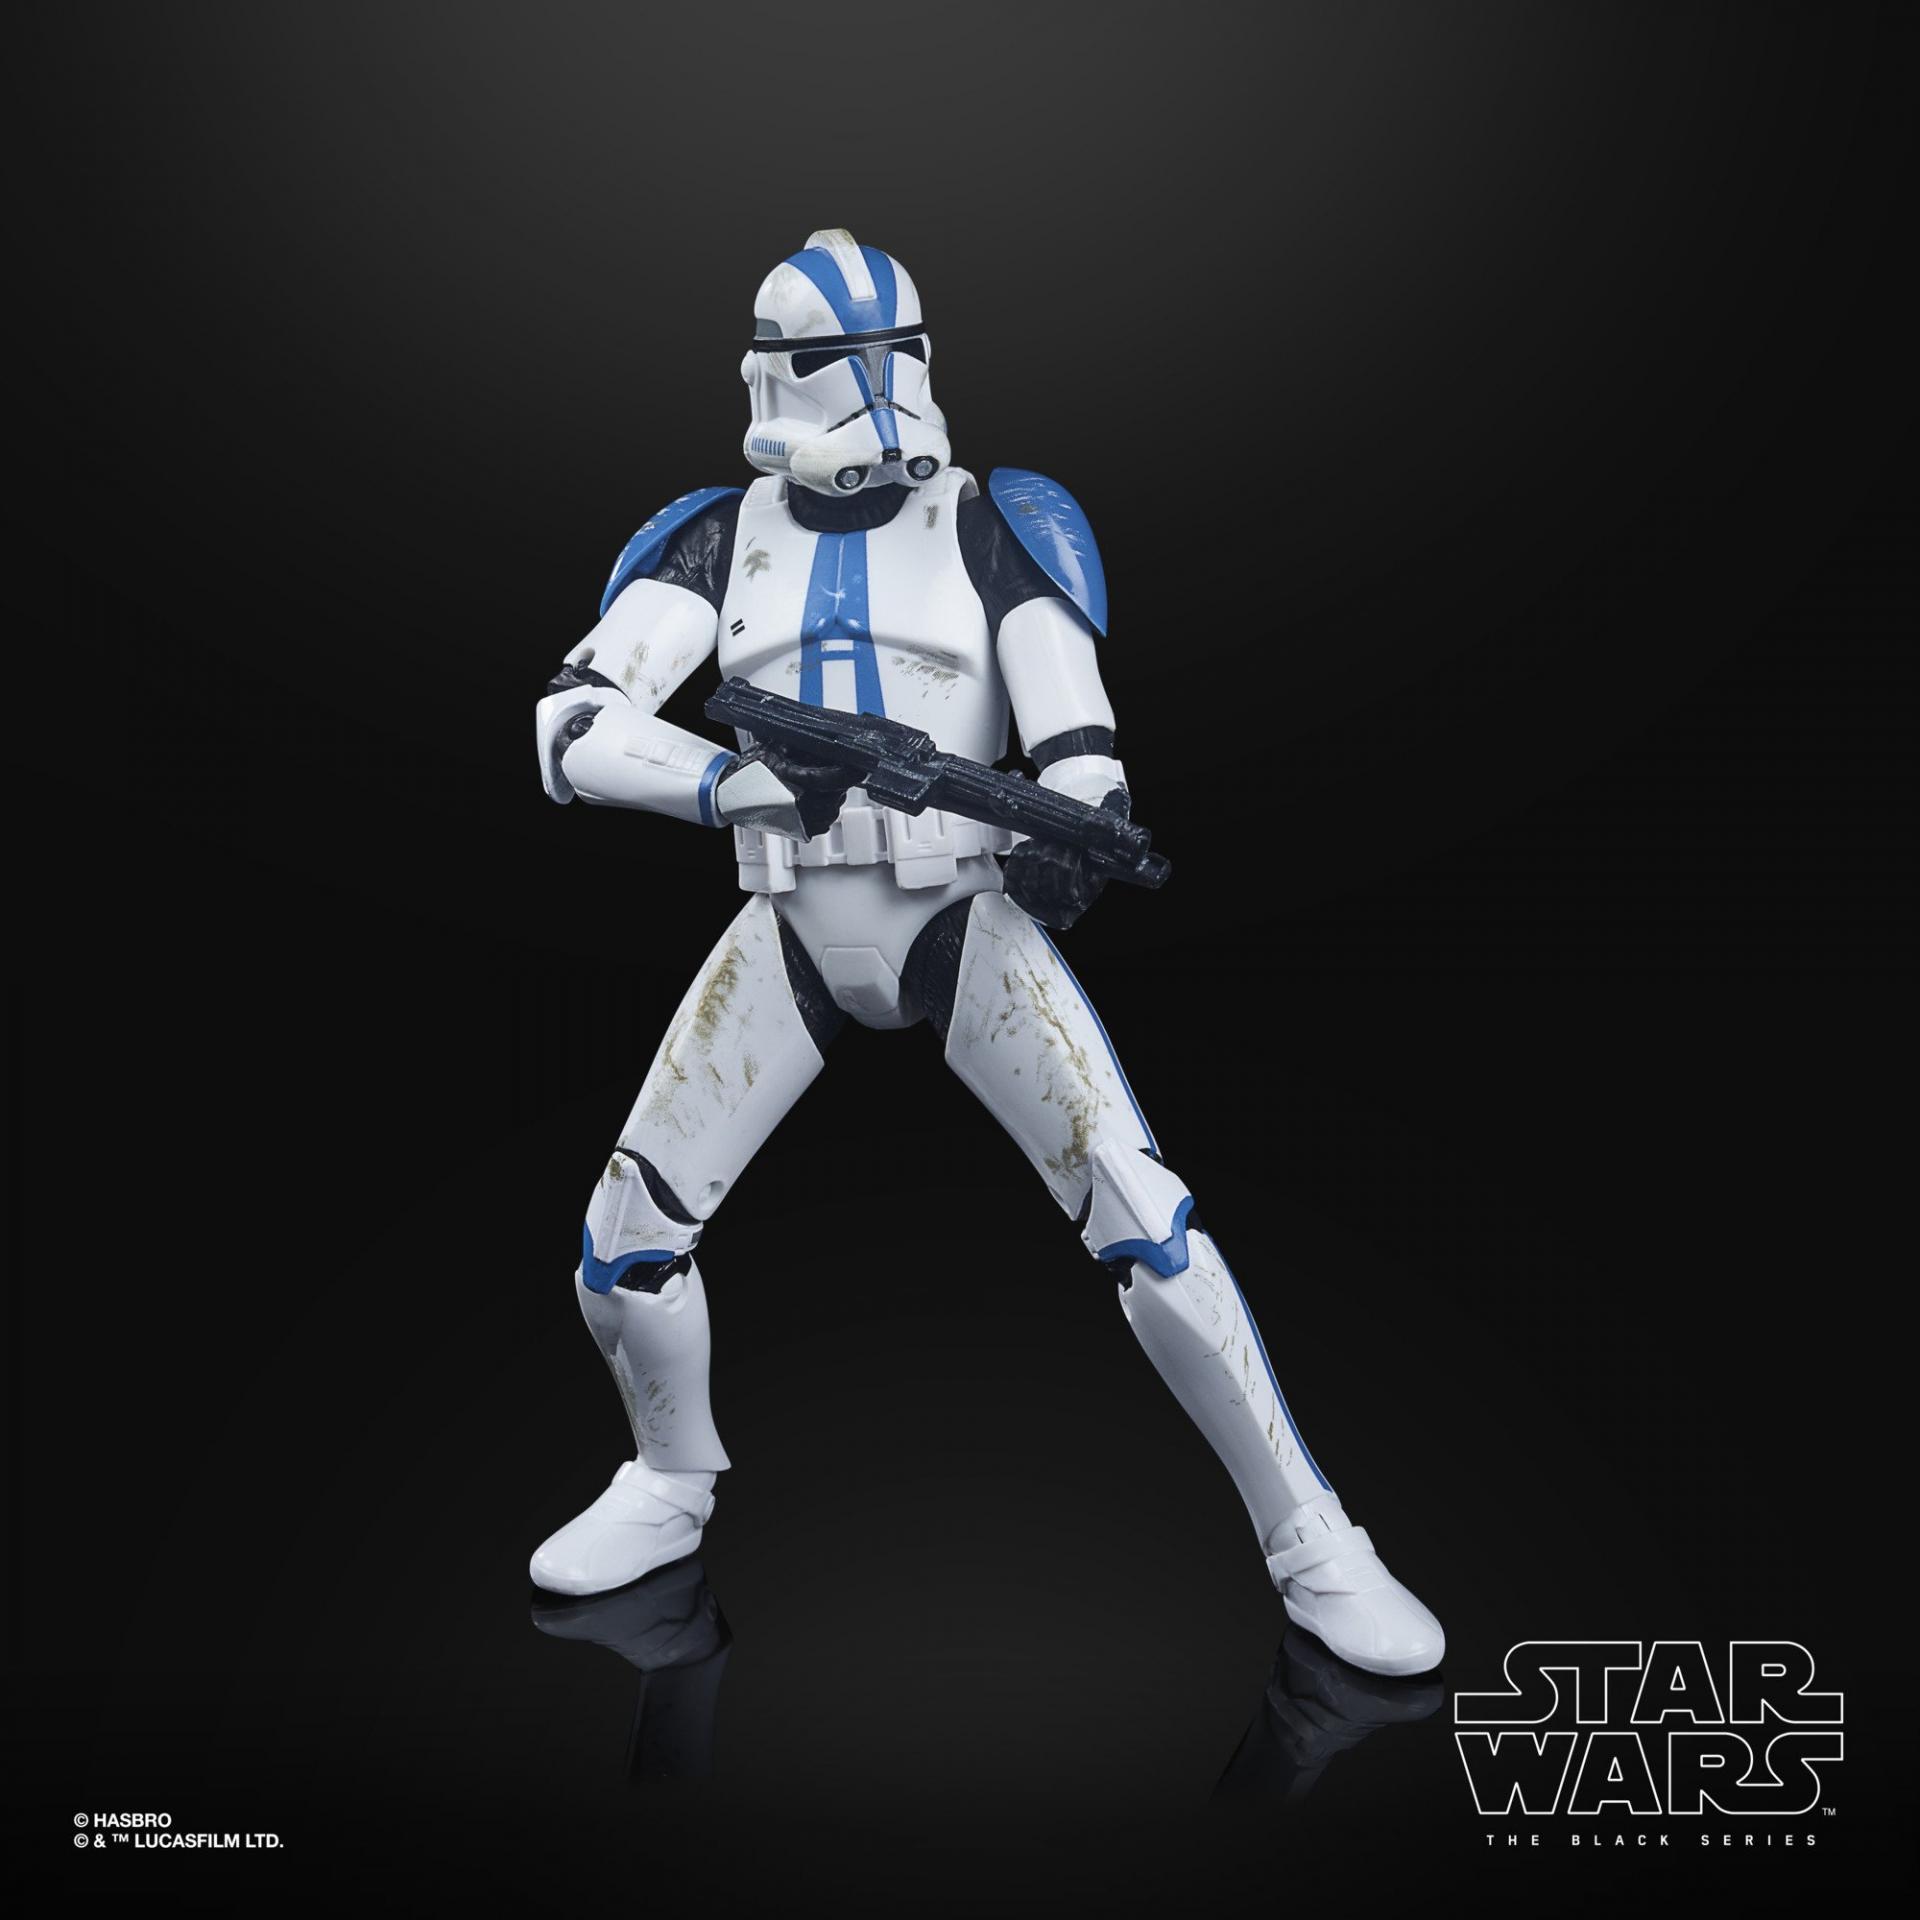 Star wars the black series archive 501st legion clone trooper 15cm2